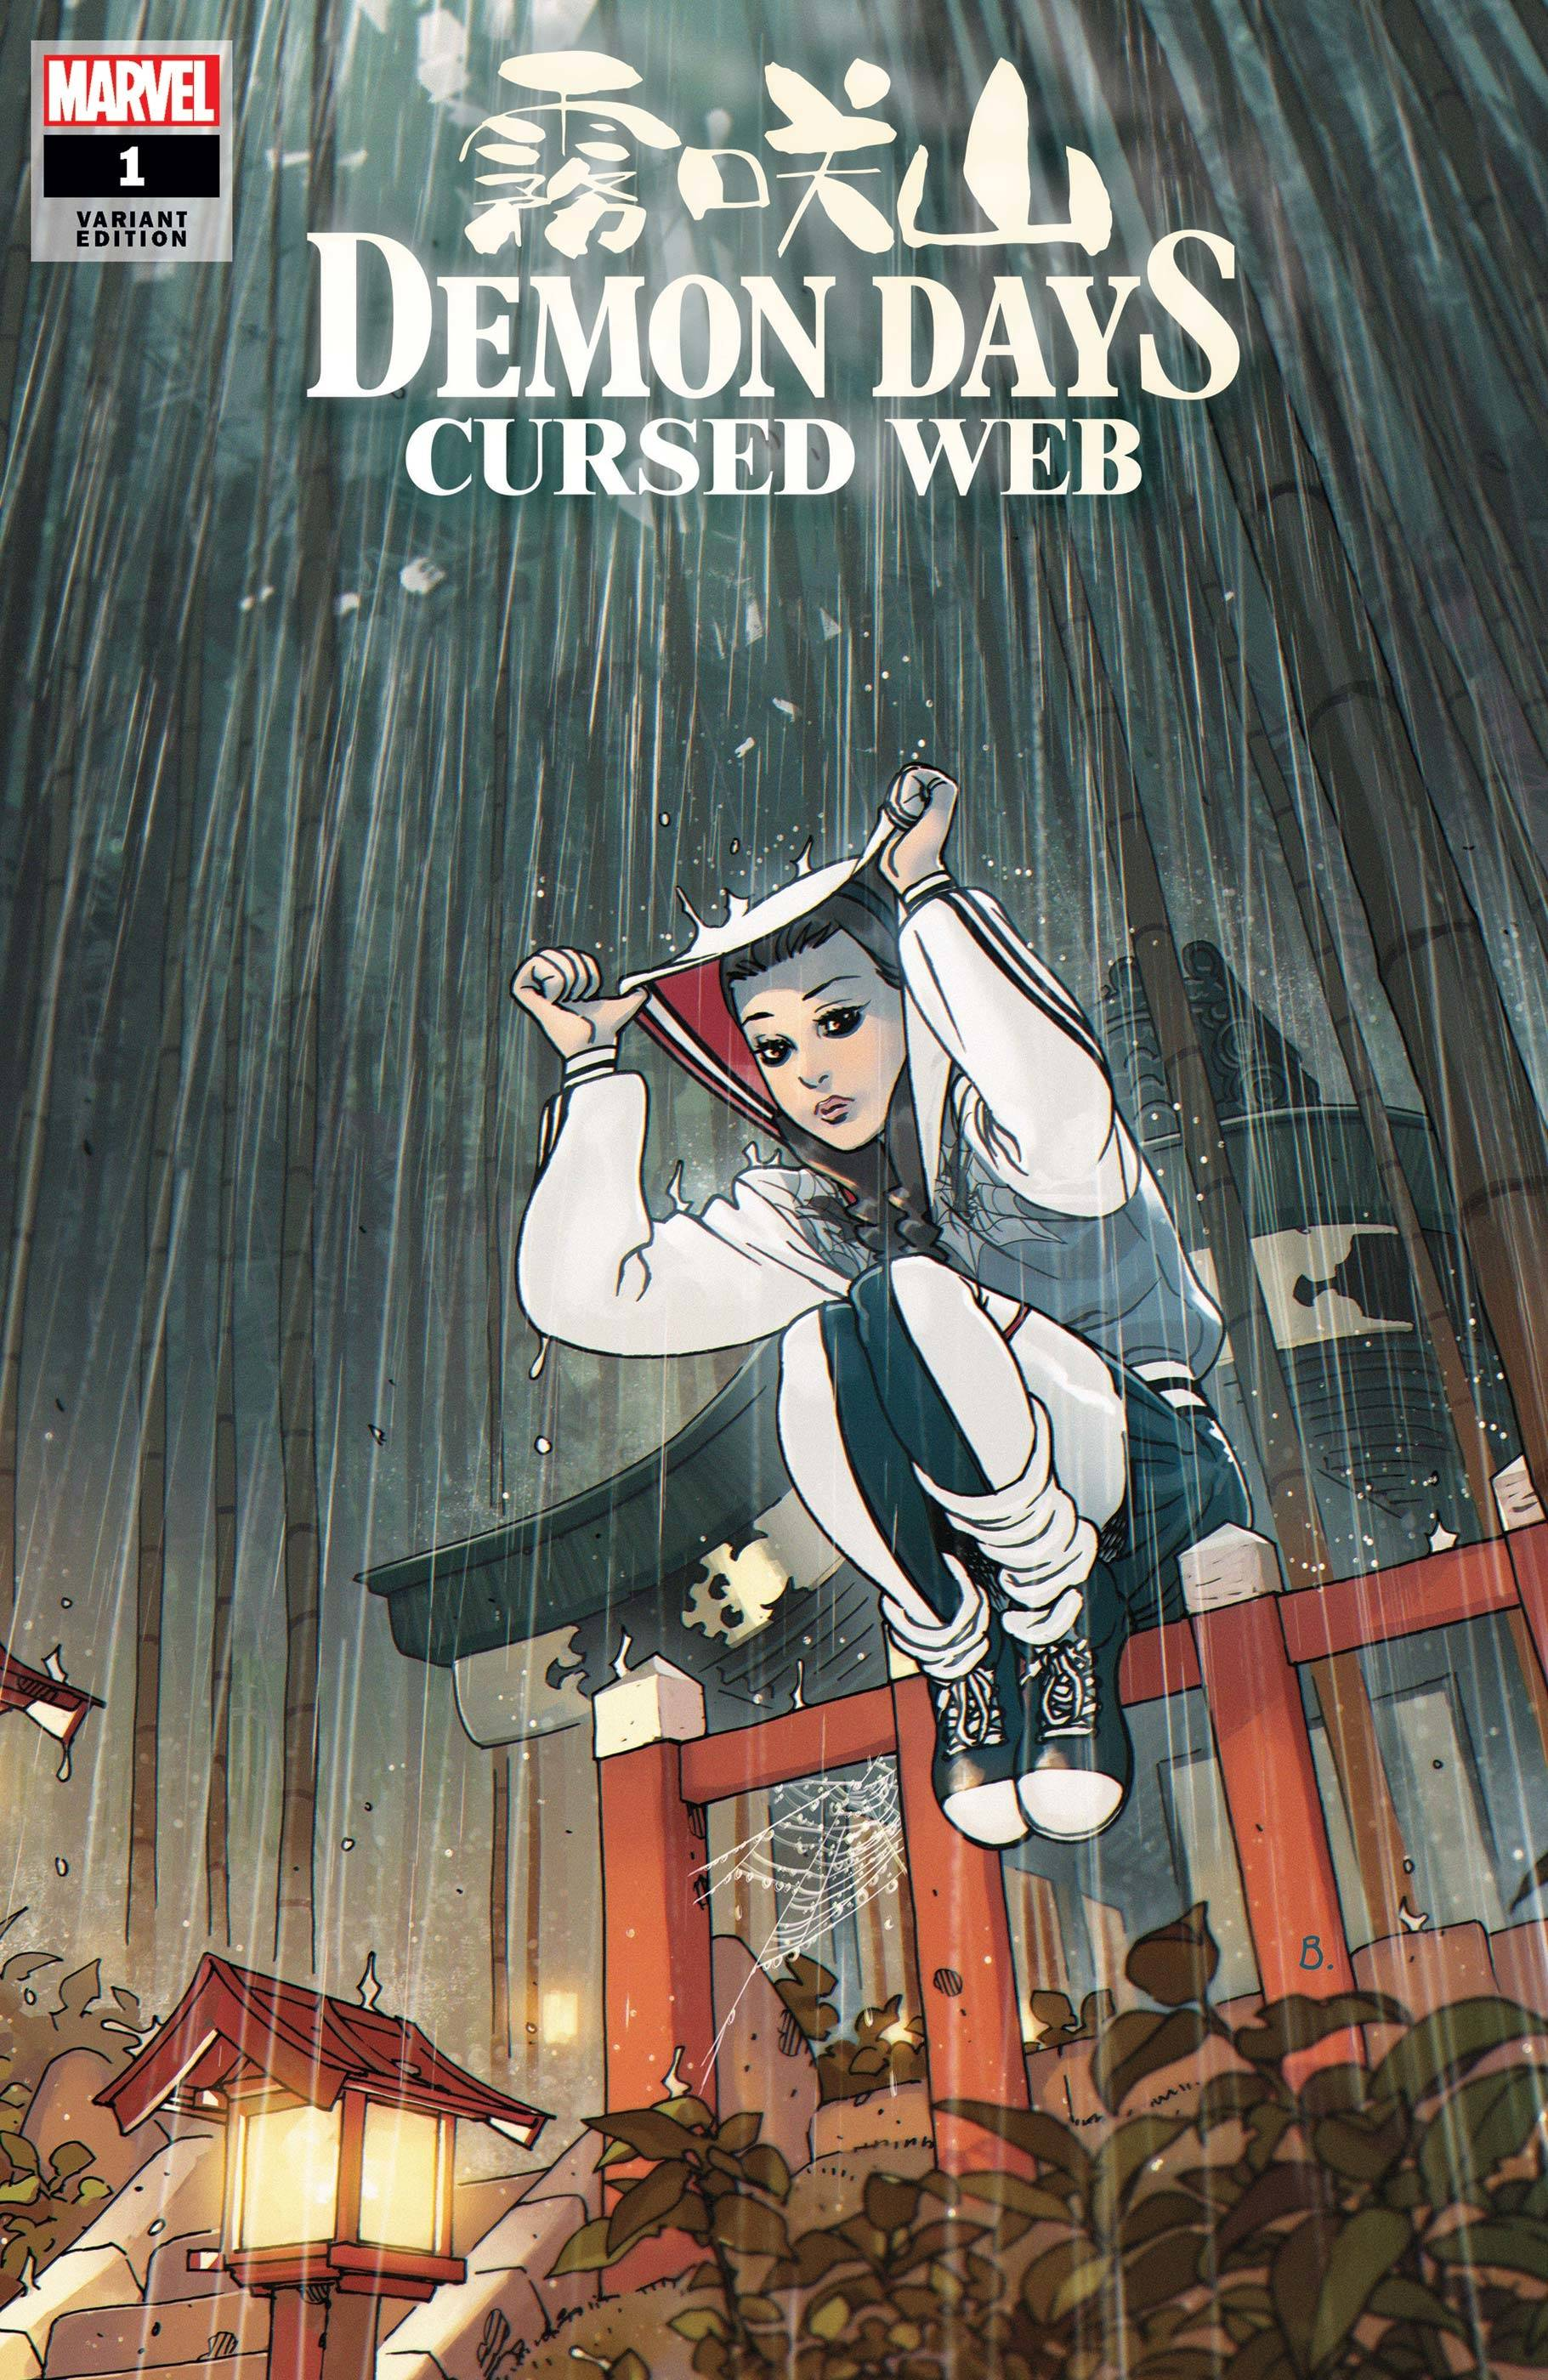 DEMON DAYS CURSED WEB #1 BENGAL VAR